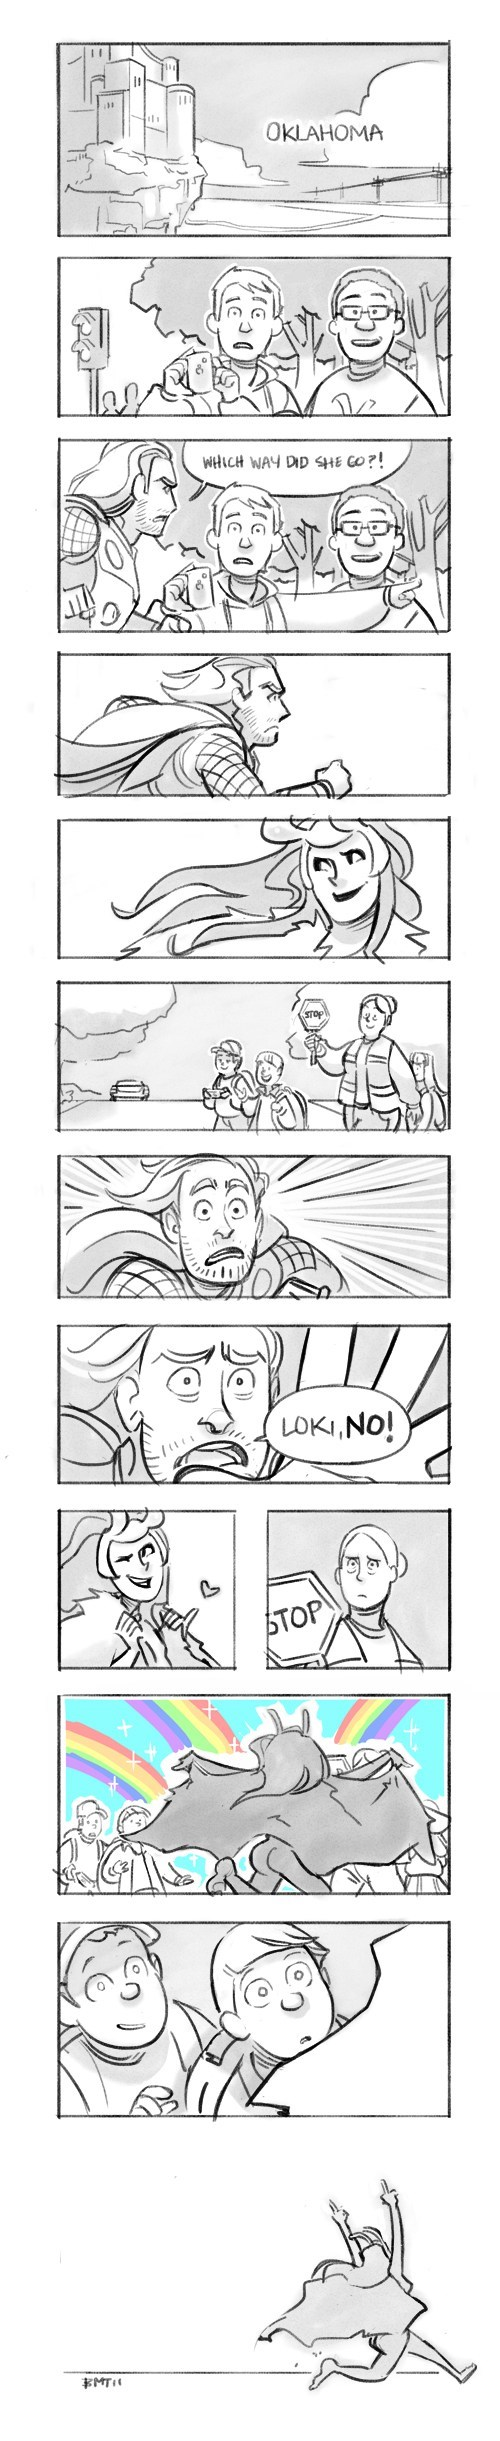 loki,Thor,comic,sexy